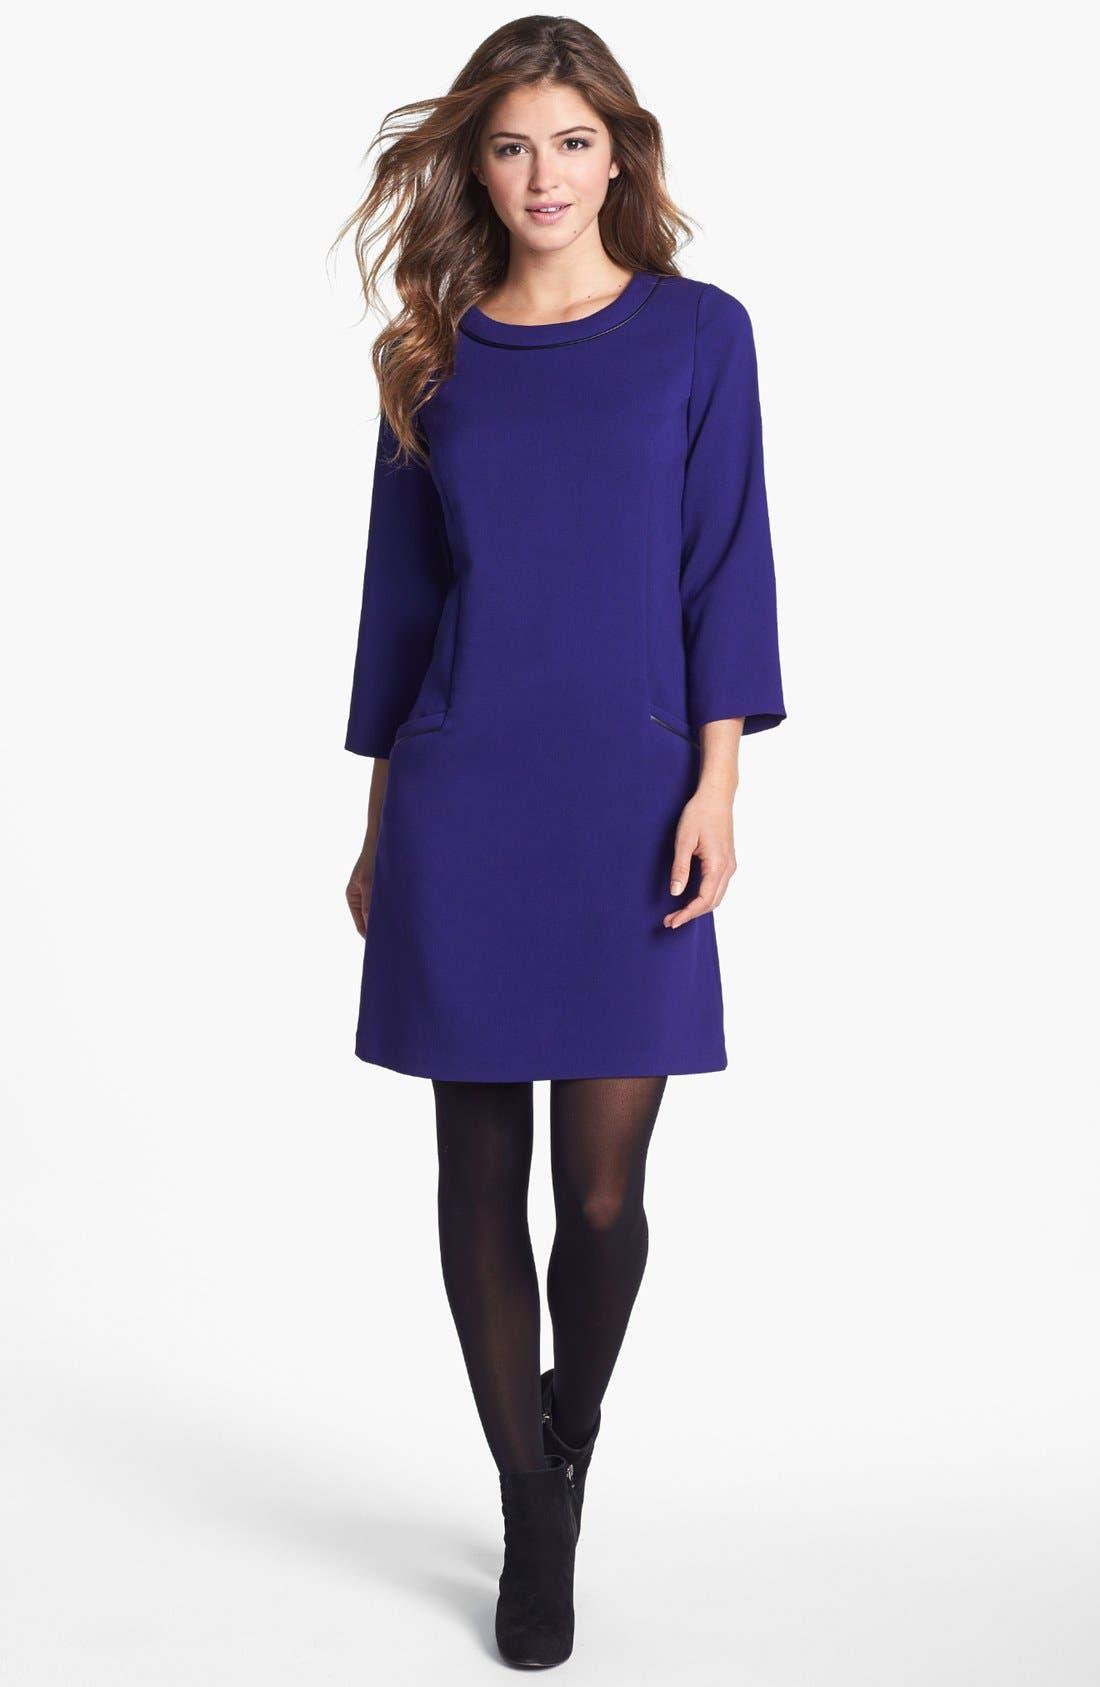 Main Image - Eliza J Faux Leather Trim Shift Dress